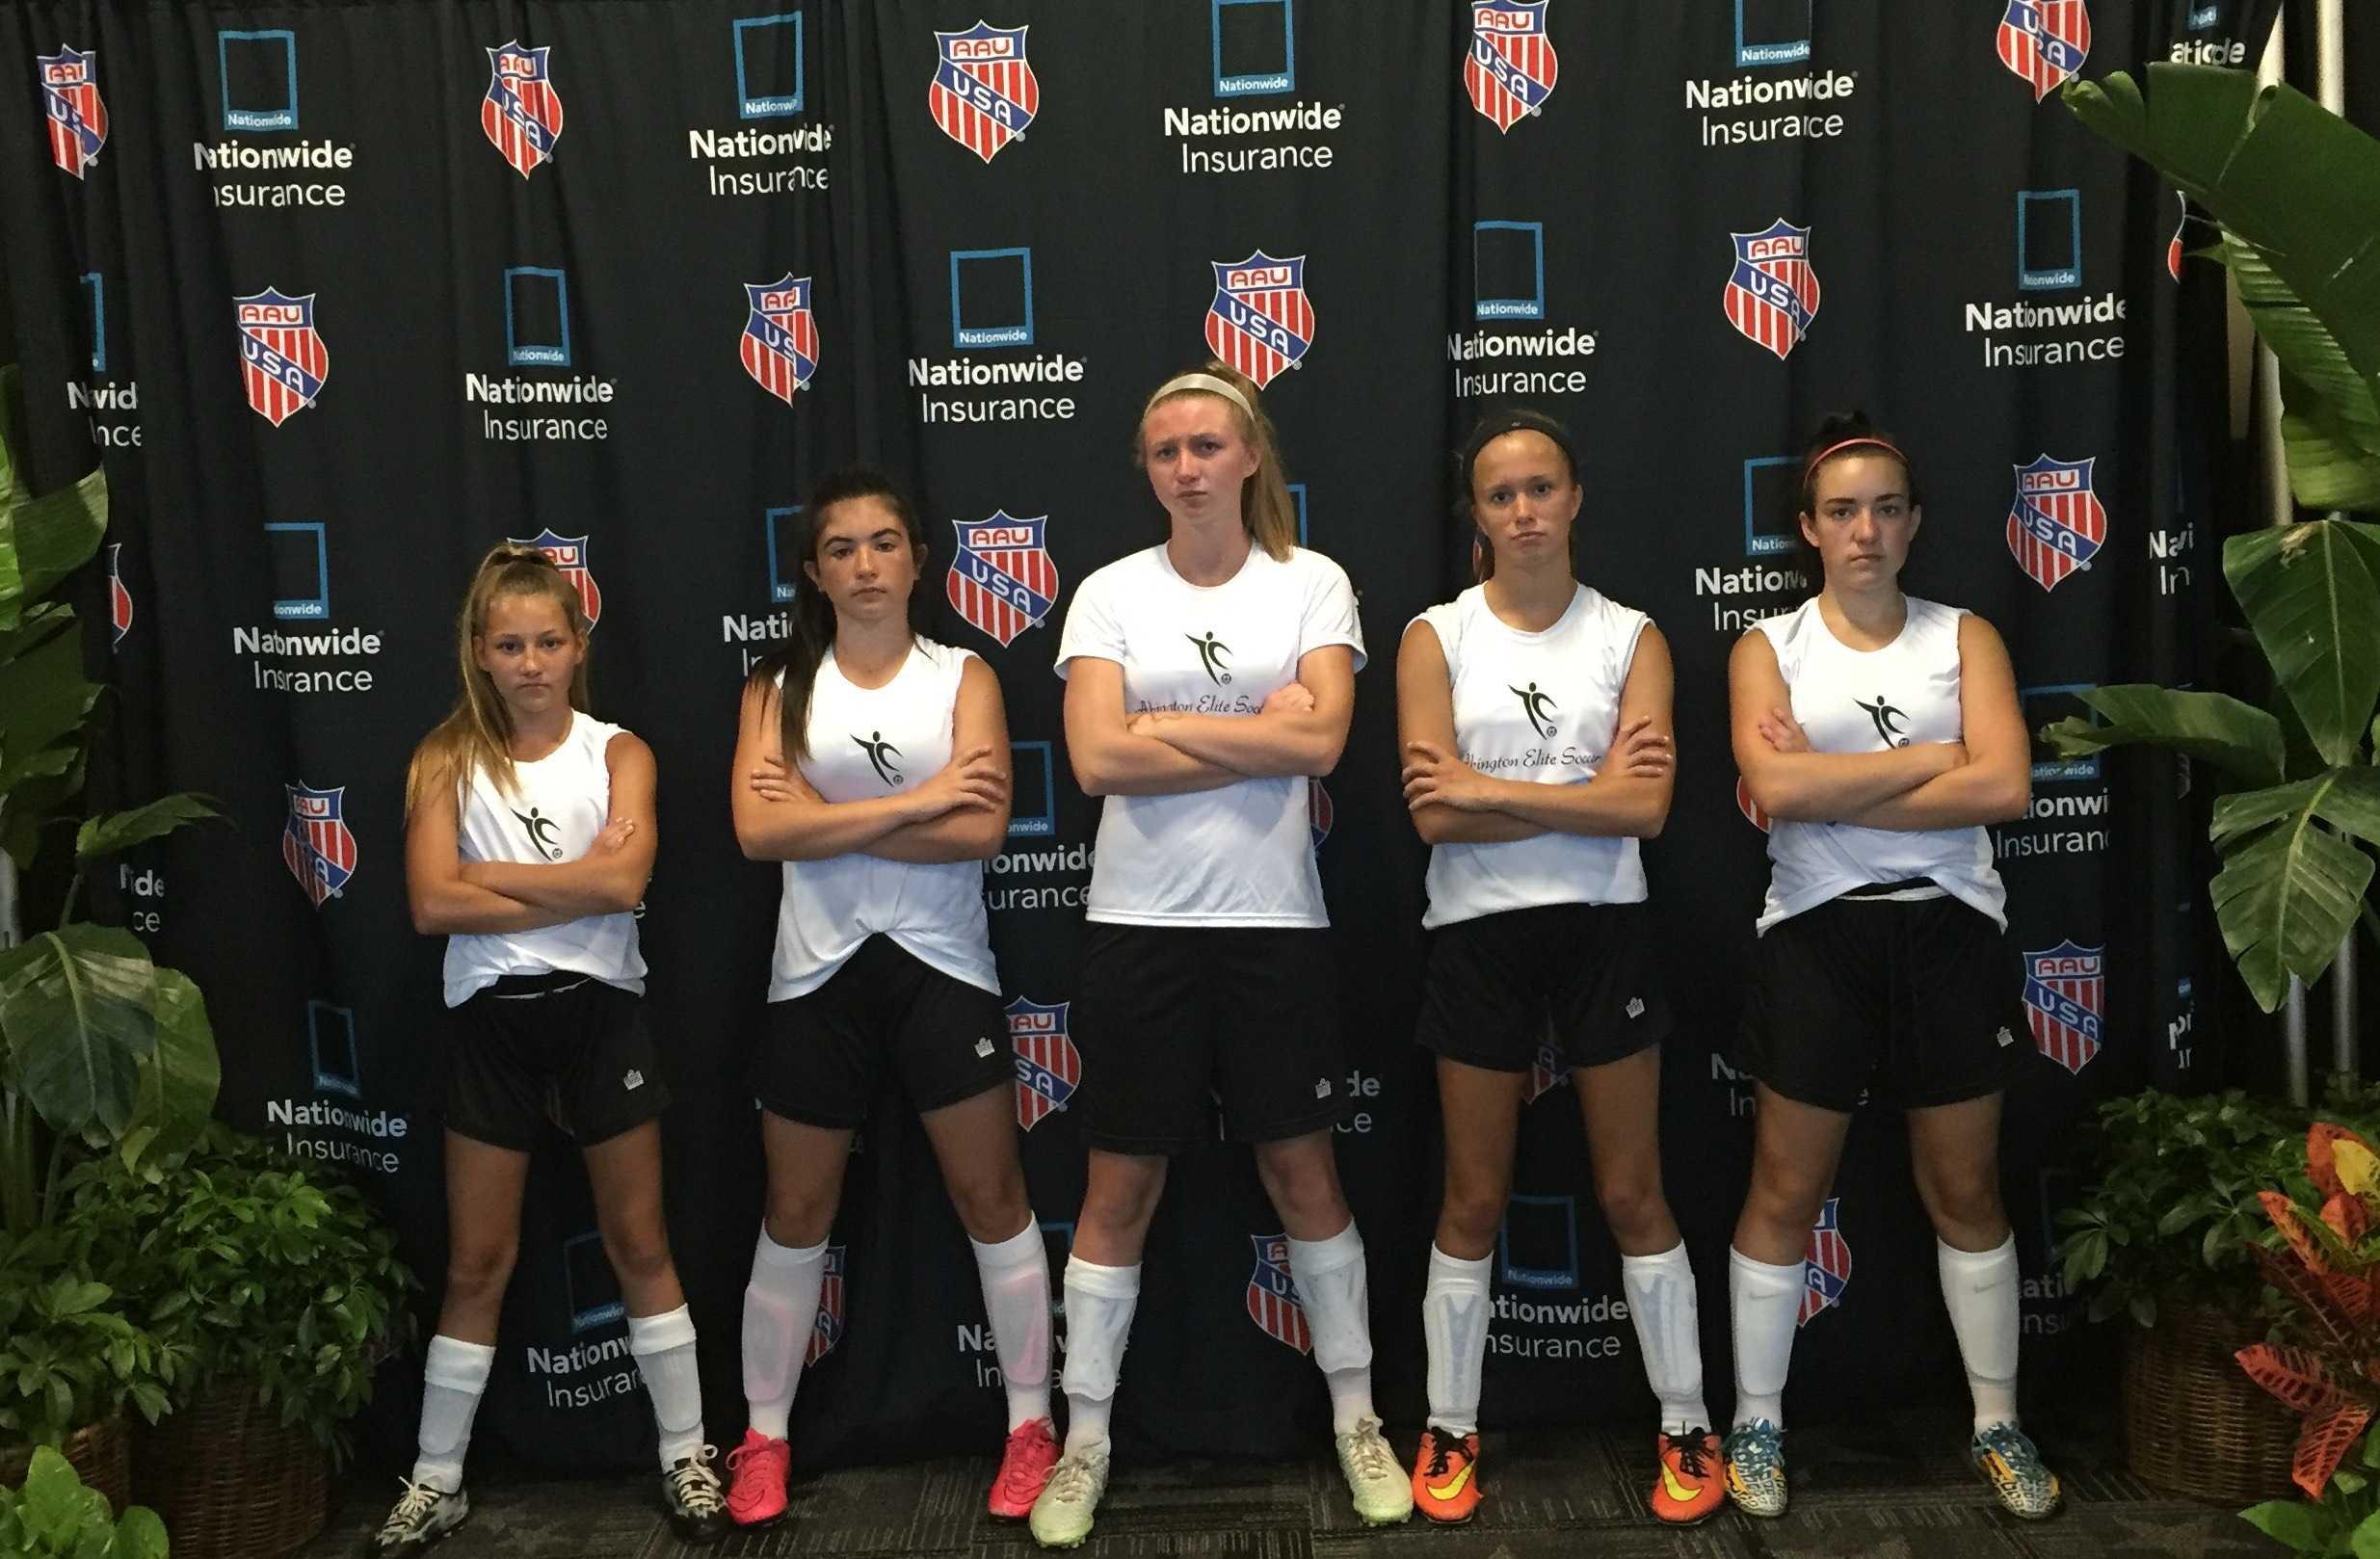 Hannah Liebke '20, Maddie Grafton '19, Brianna McCadden '18 and Kayli Tobin '20 at the ESPN Wide World of Sports Pavilion